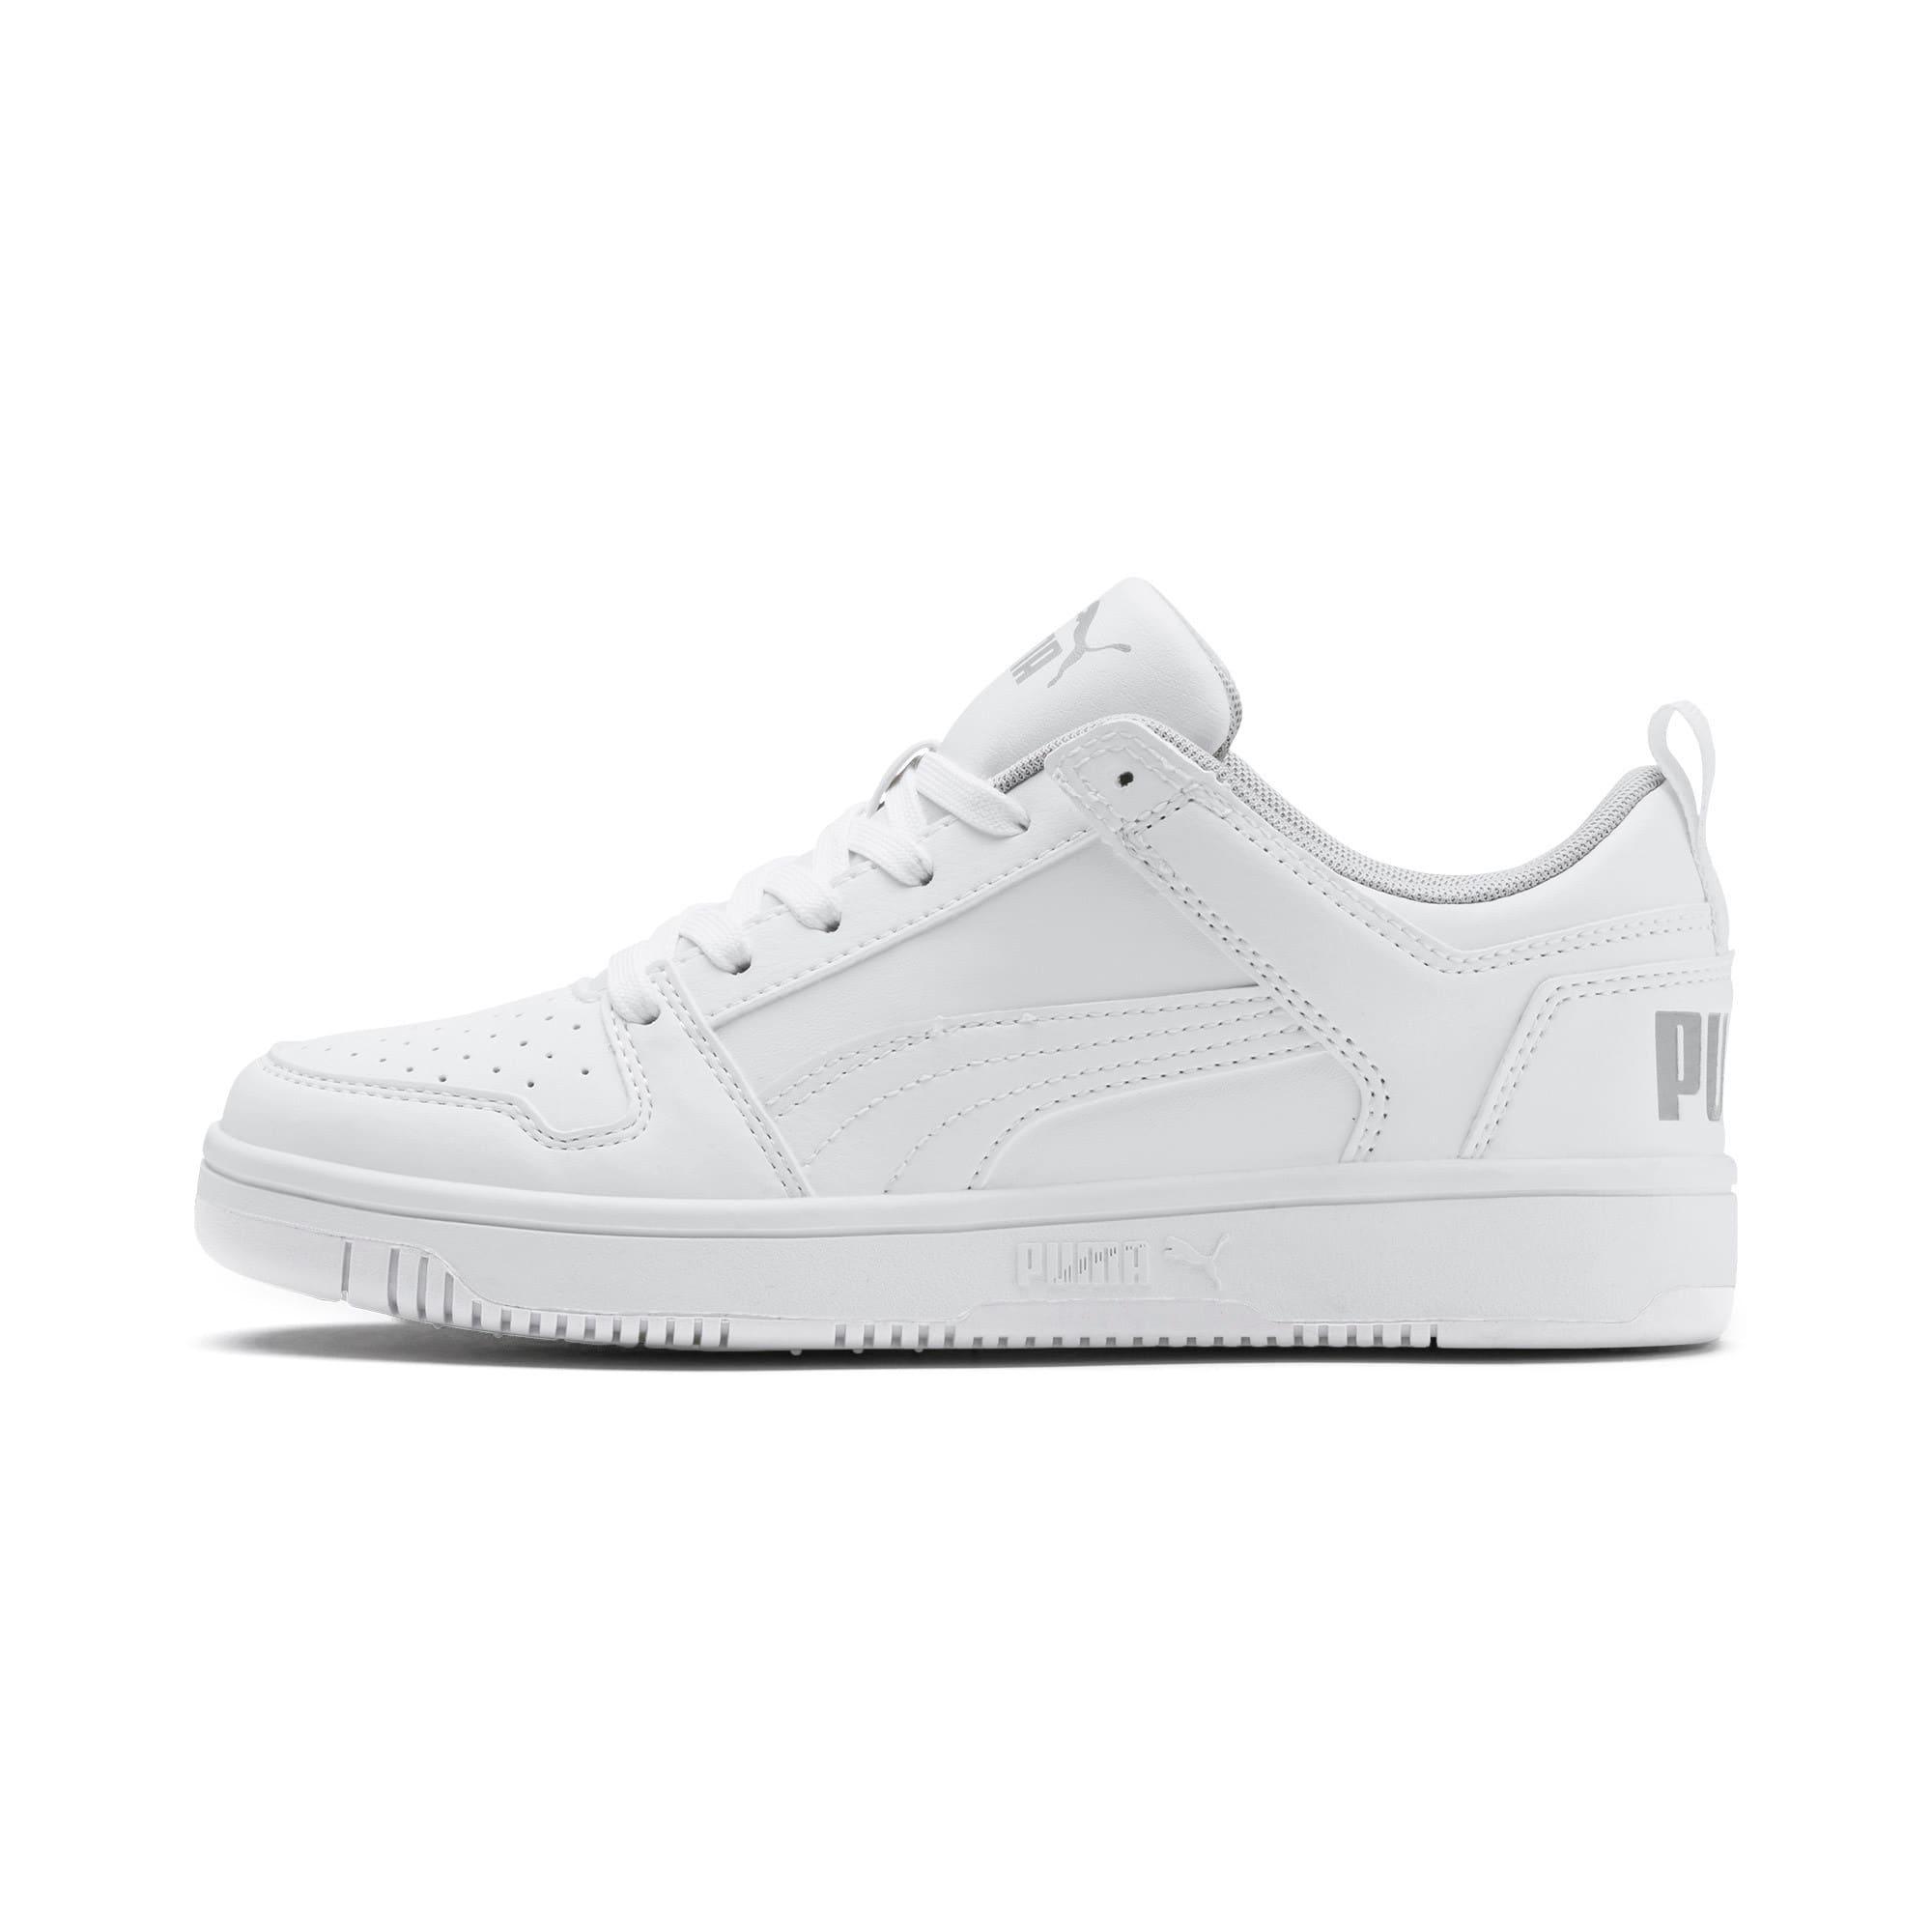 Thumbnail 1 of PUMA Rebound LayUp Lo Sneakers JR, Puma White-High Rise, medium